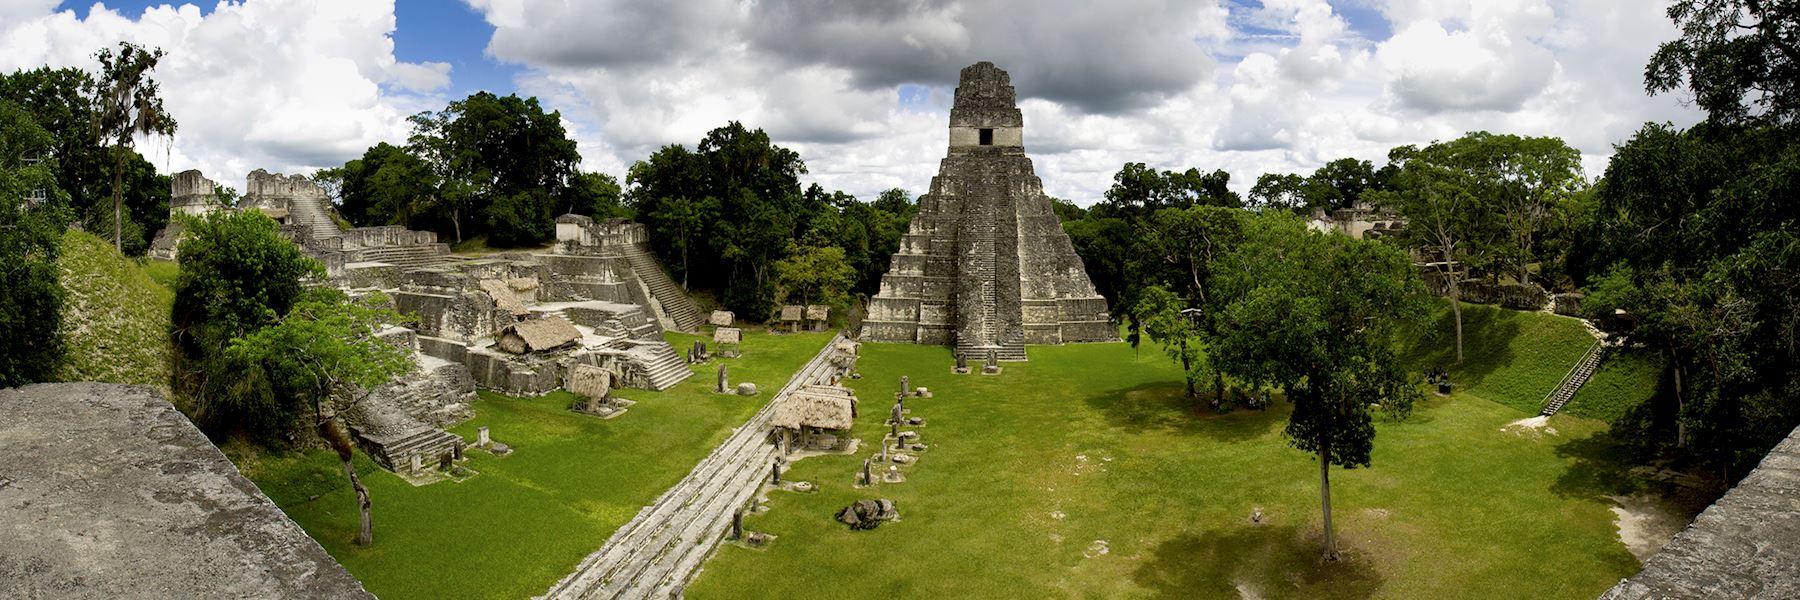 Guatemala trip ideas